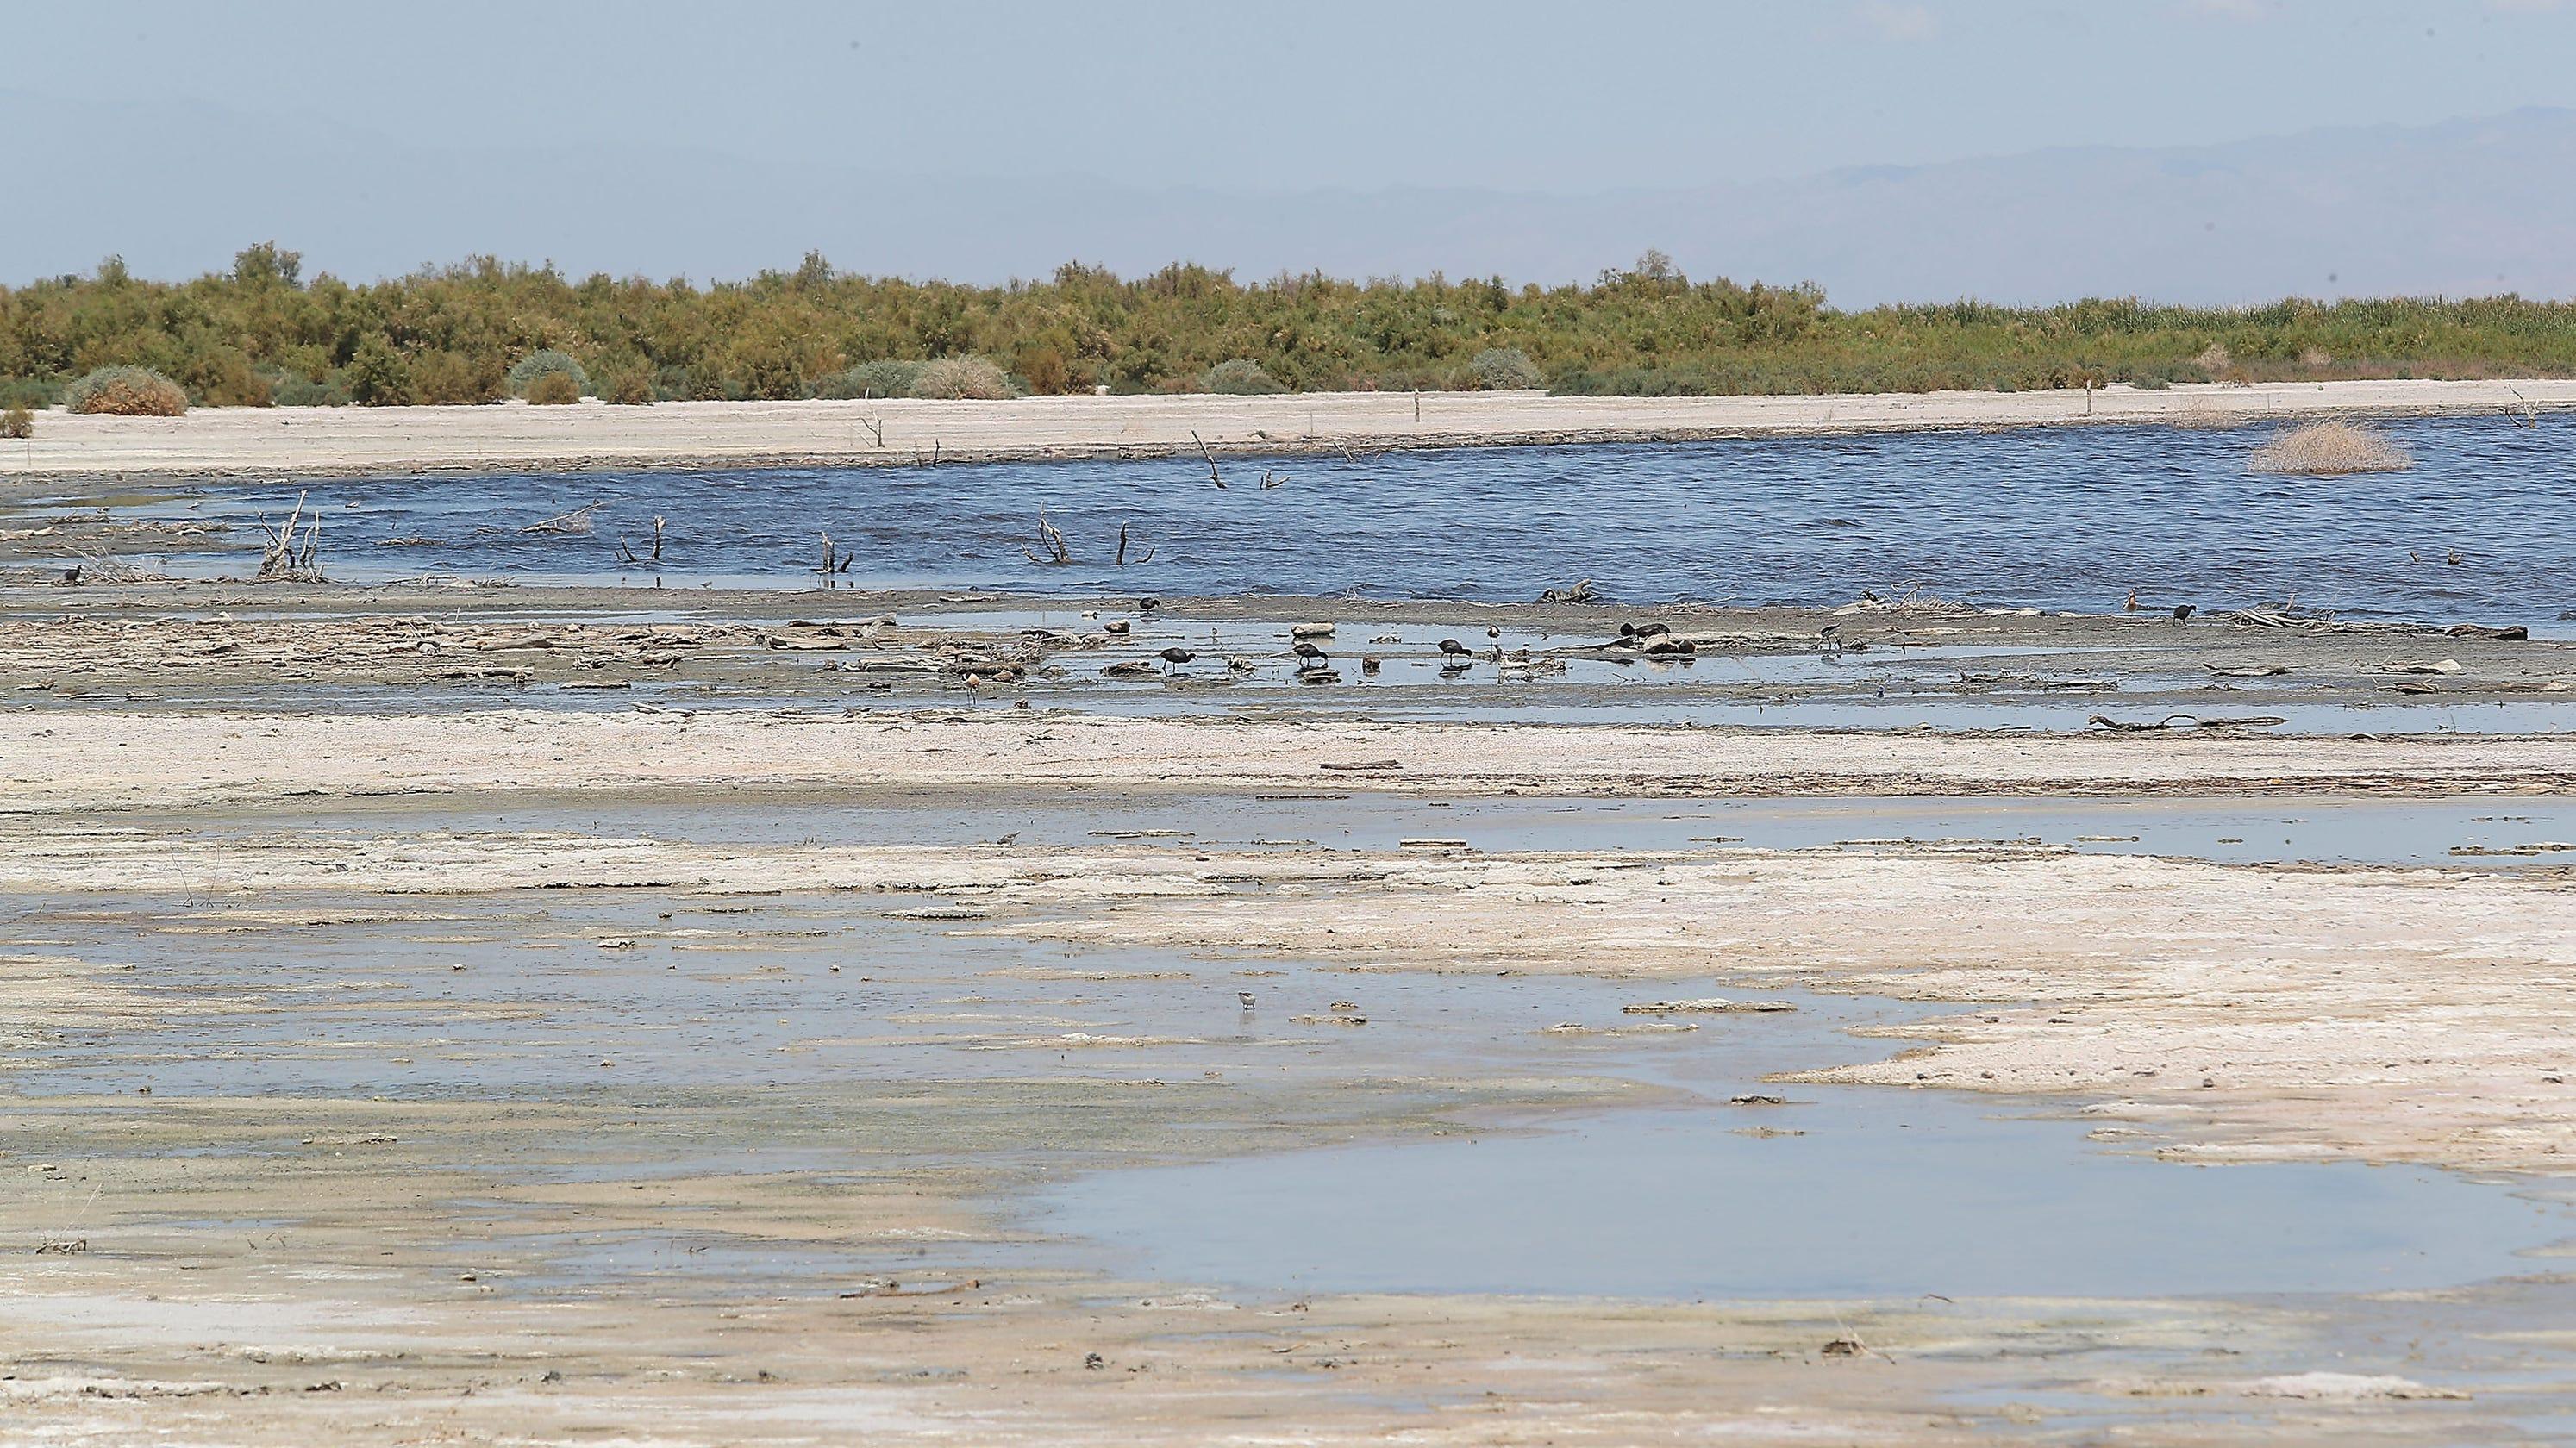 Valley Voice: Seemingly stalled Salton Sea restoration makes ocean water importation key - The Desert Sun